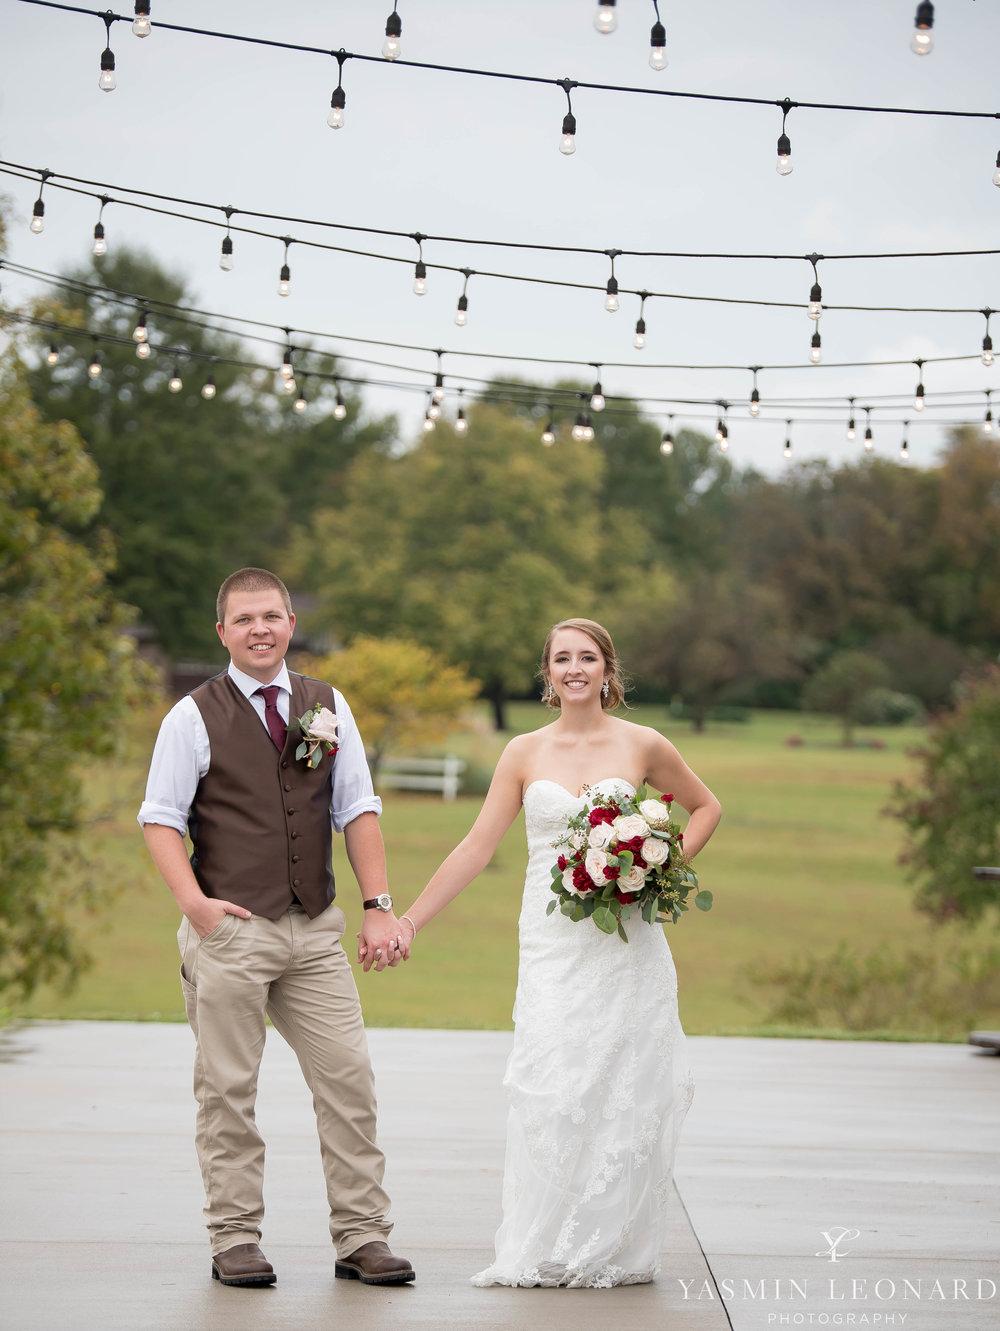 Millikan Farms - NC Wedding Venue - NC Wedding Photographer - Yasmin Leonard Photography - Rain on your wedding day-55.jpg